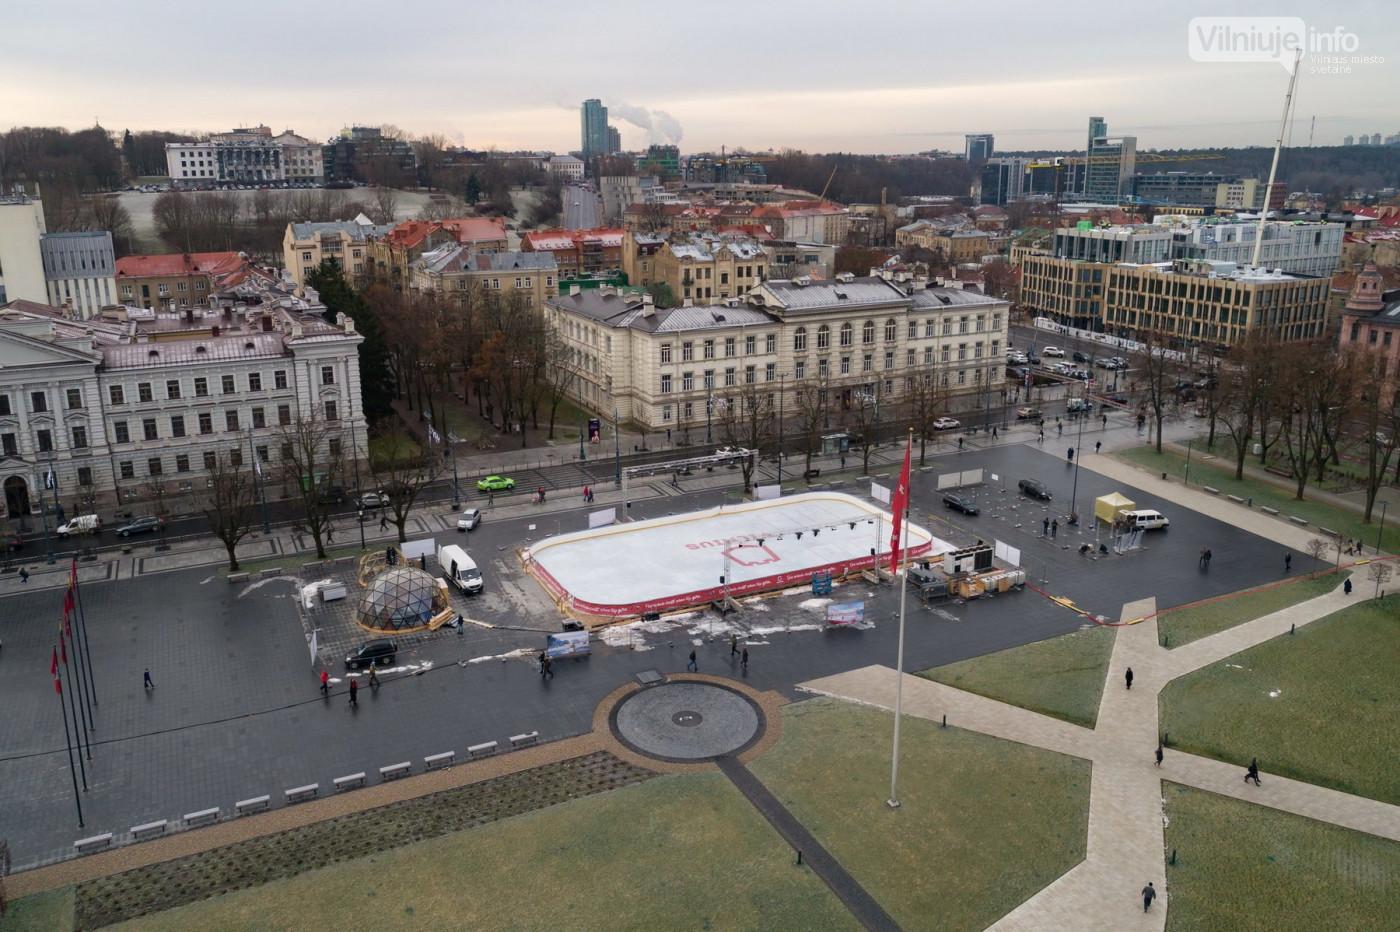 50m² Ø8m Купол Рождественский каток на площади Лукишкес, Вильнюс